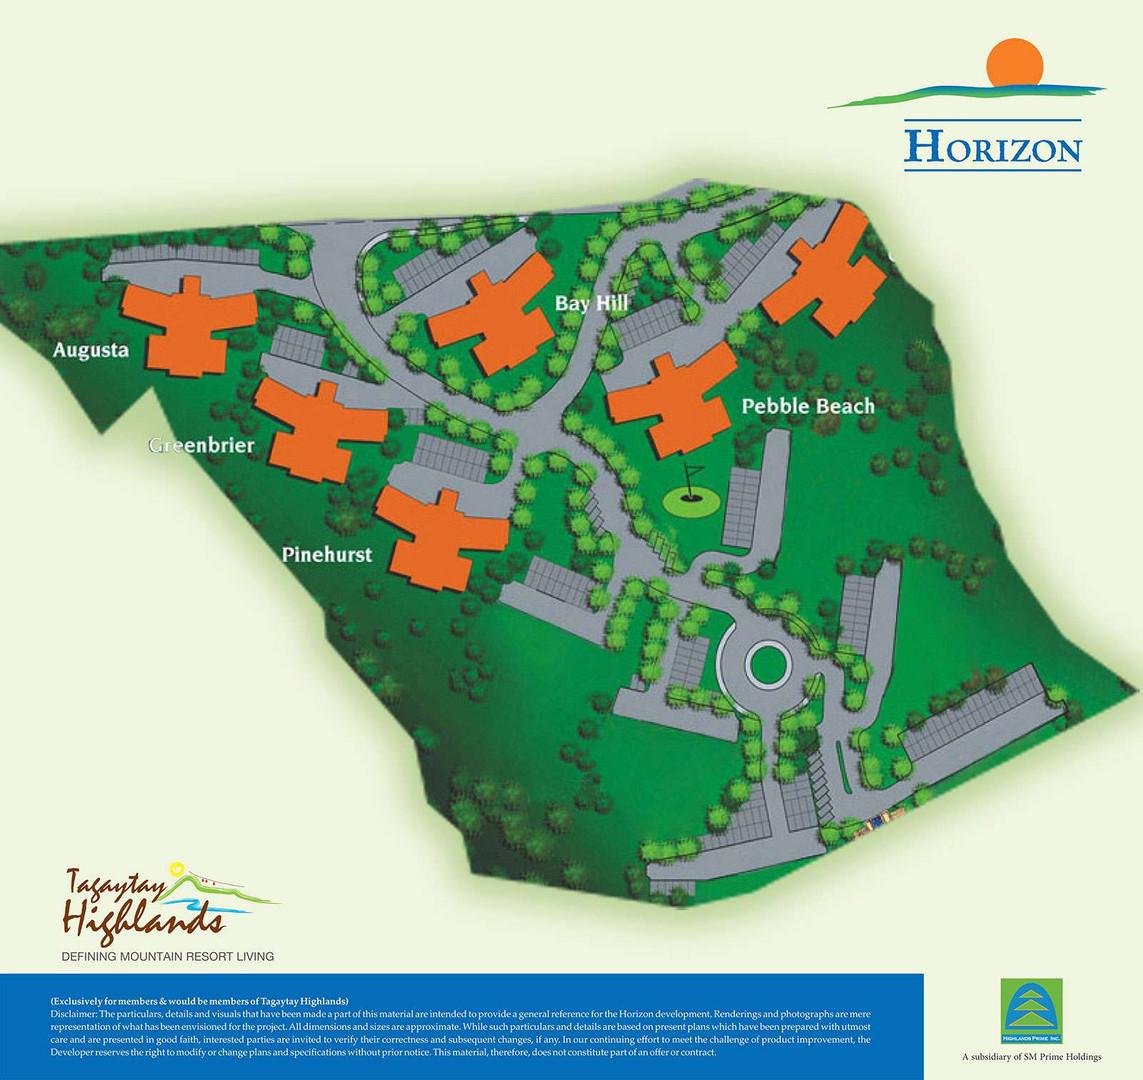 Horizon's Site Development Plan